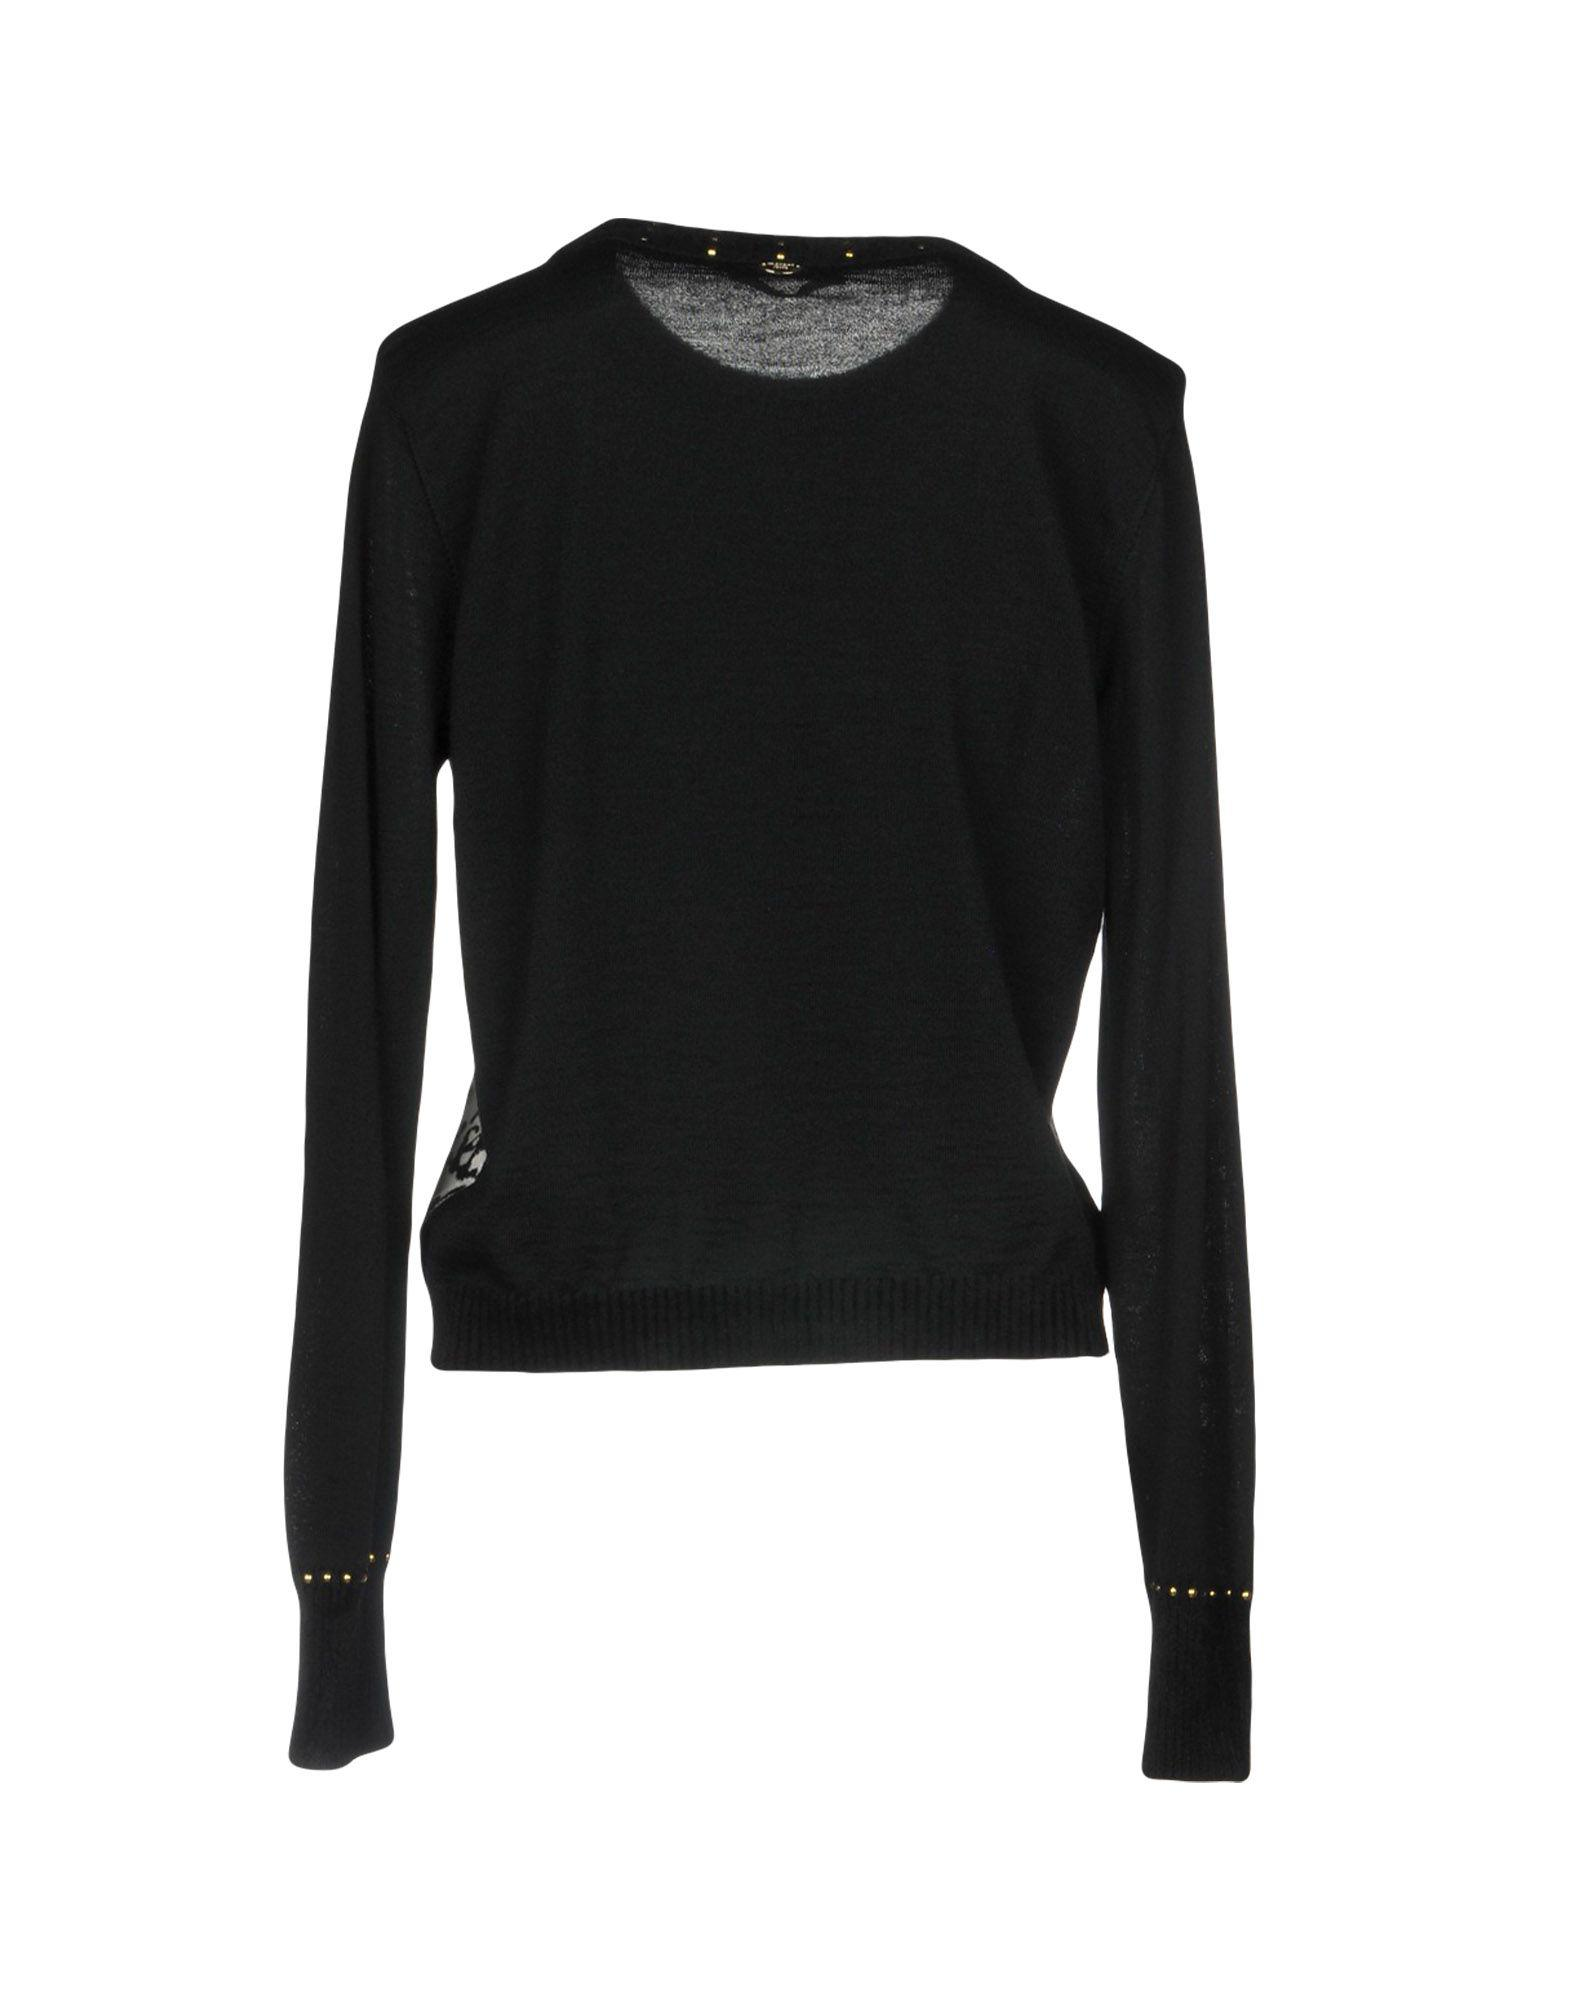 Marani Jeans Wool Sweater in White